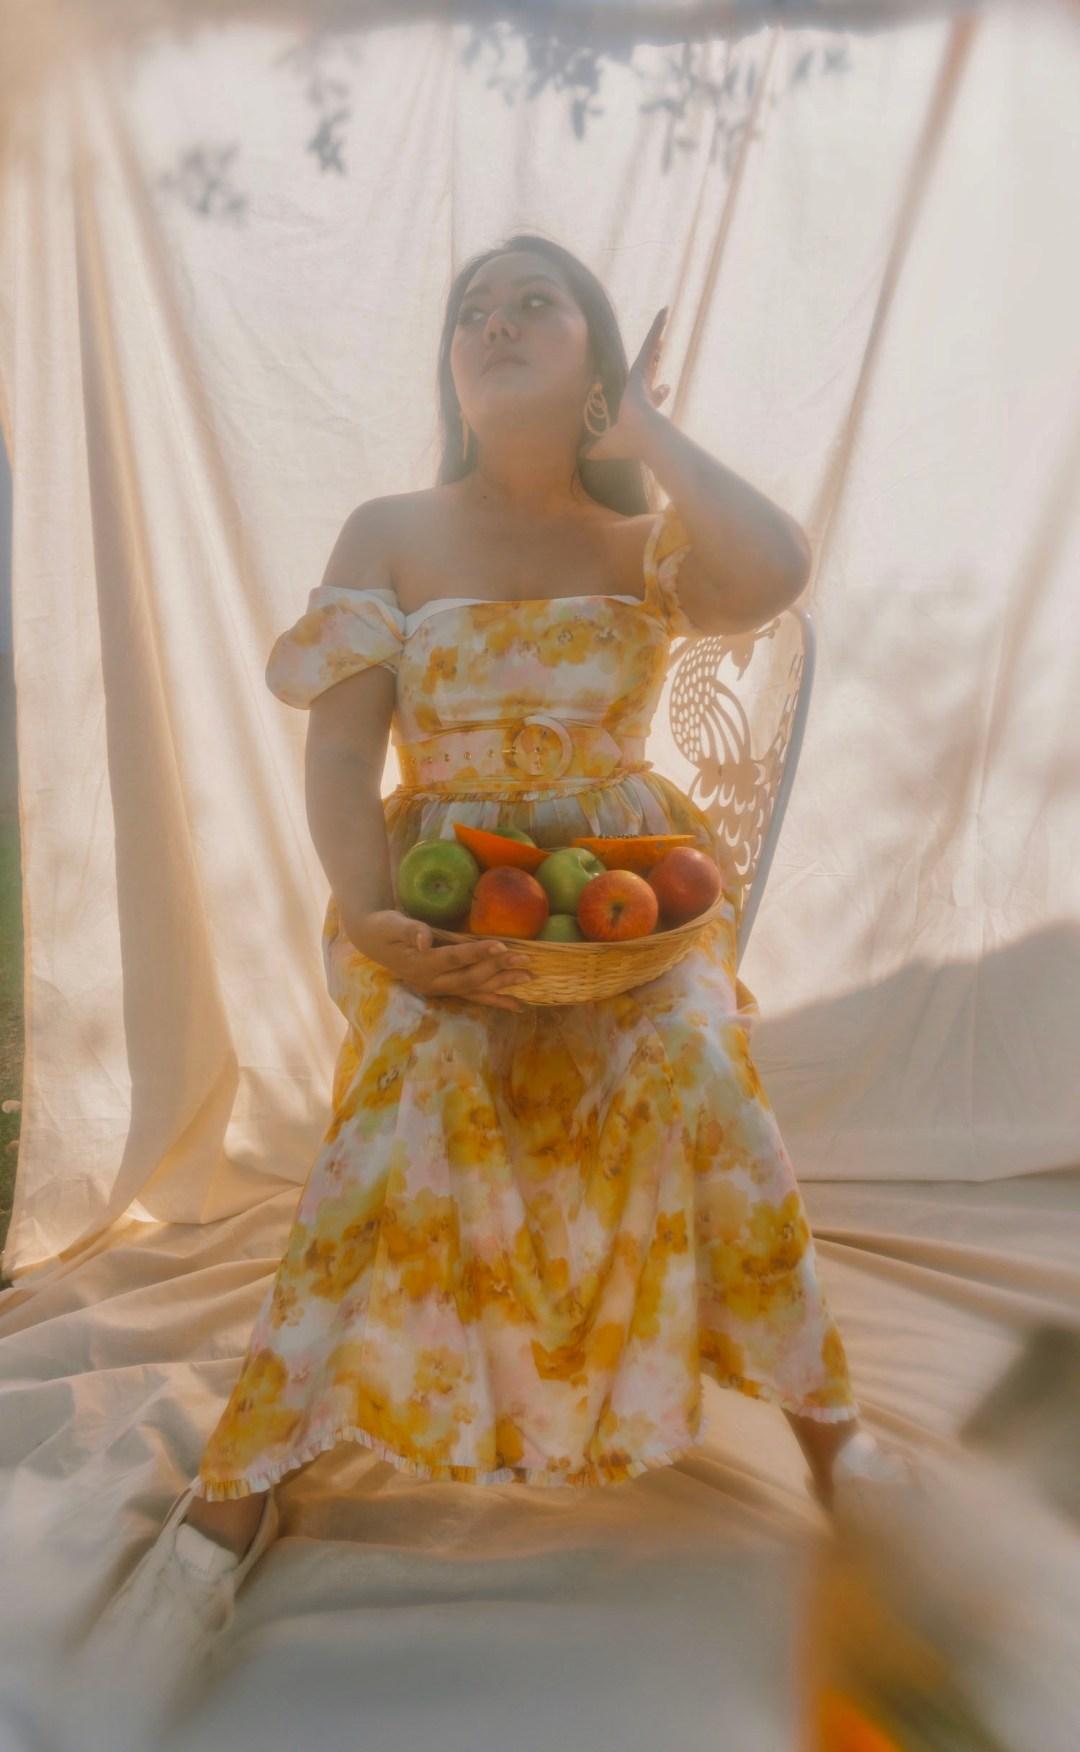 snack-bar-decor-idea-allaboutgoodvibes.com-Mollie-Larsen-@curatedbymollie